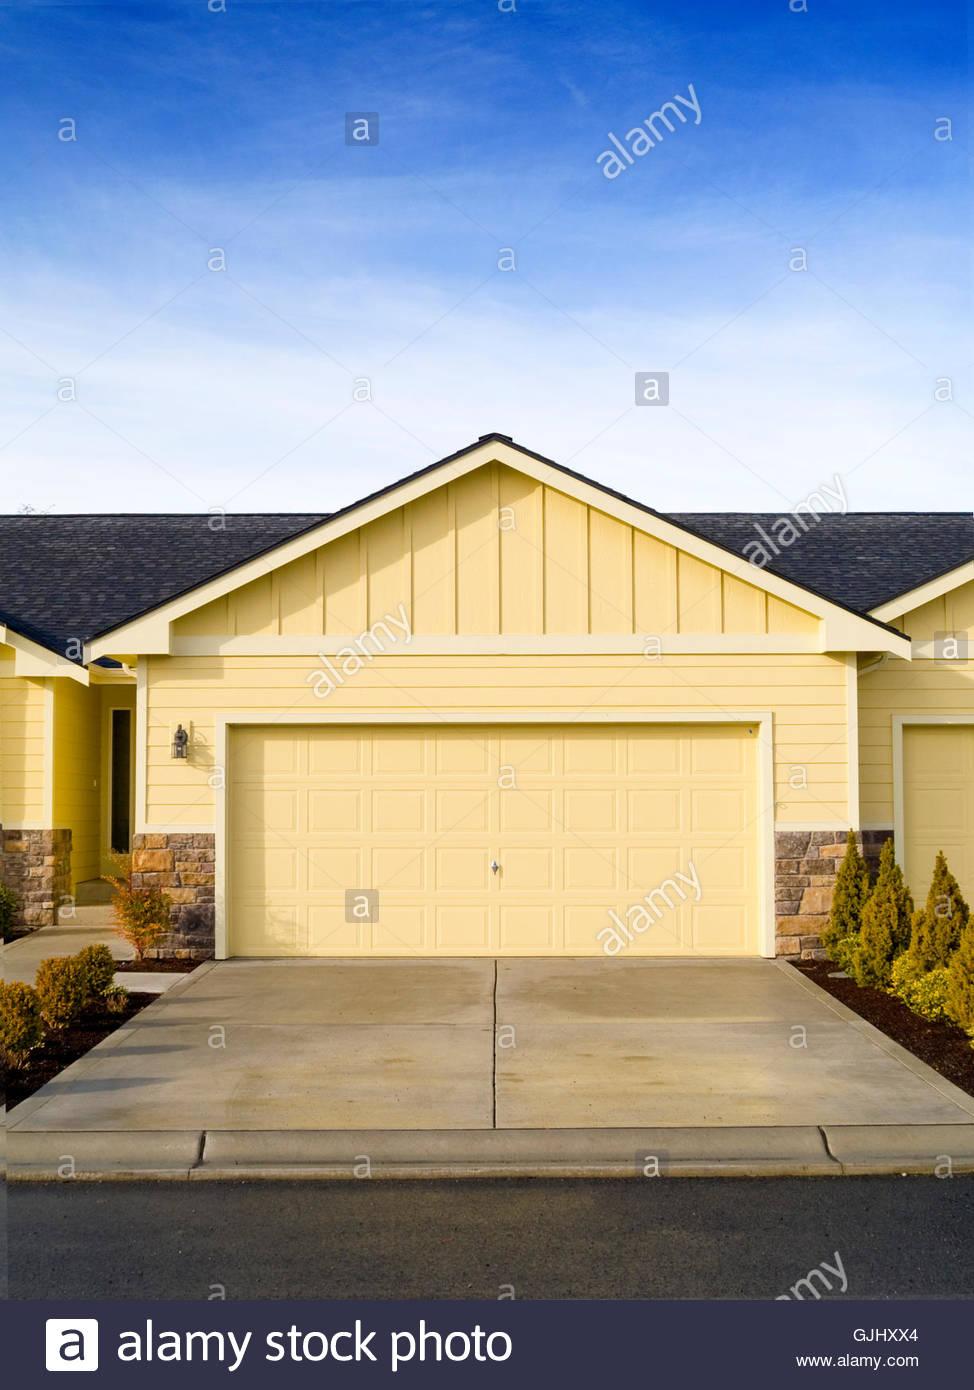 house building duplex - Stock Image